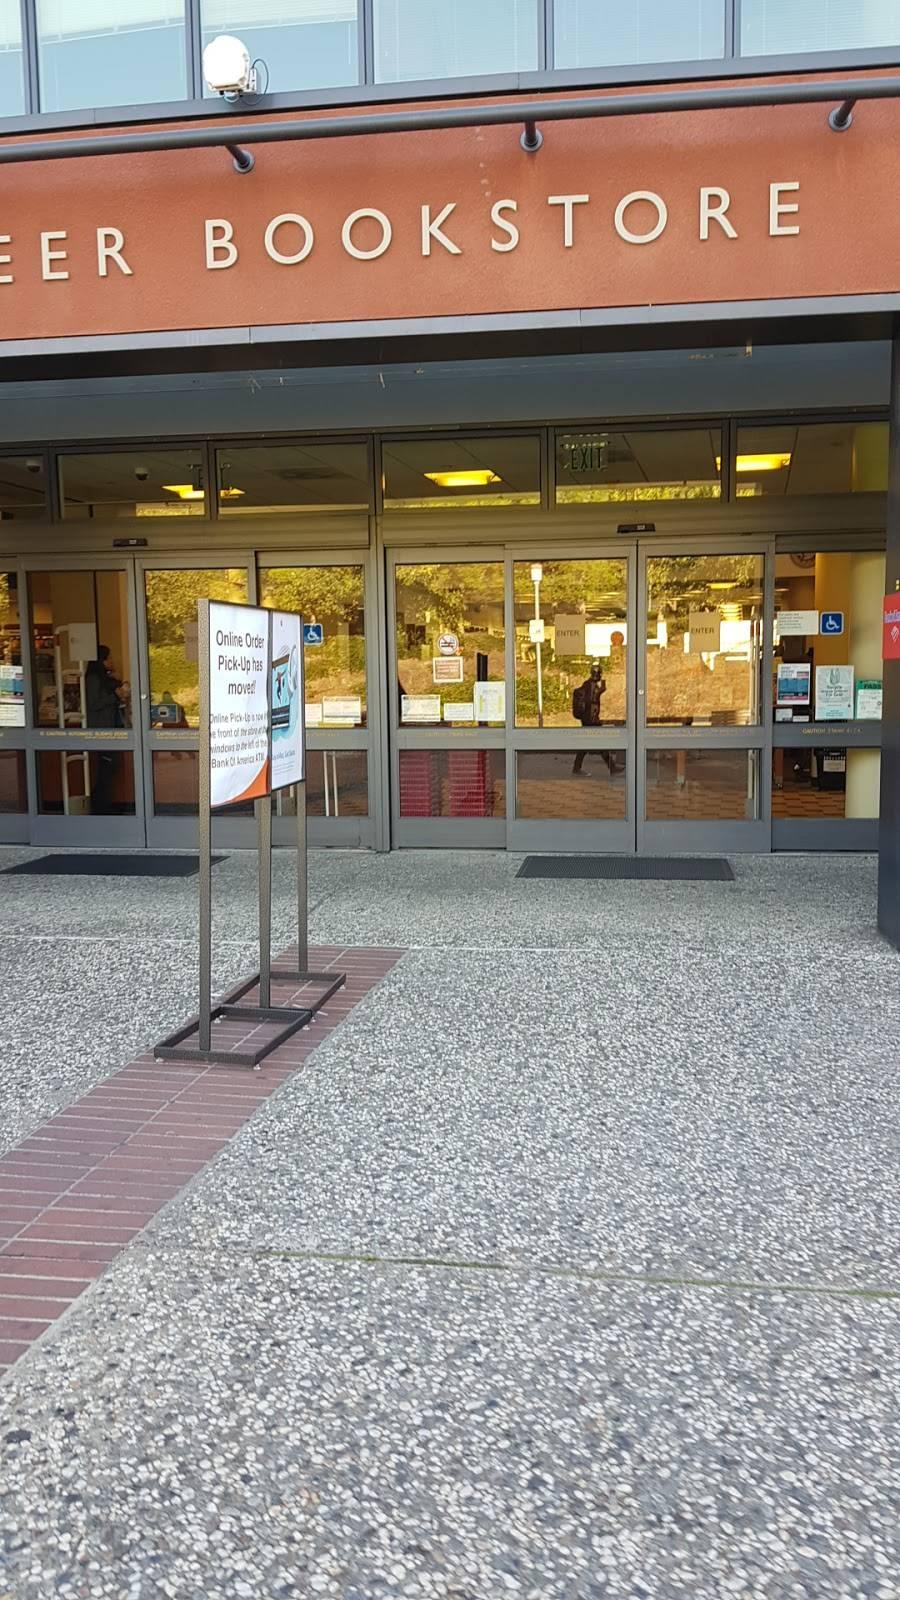 Pioneer Bookstore - book store  | Photo 1 of 3 | Address: 25976 Carlos Bee Blvd, Hayward, CA 94542, USA | Phone: (510) 885-3507